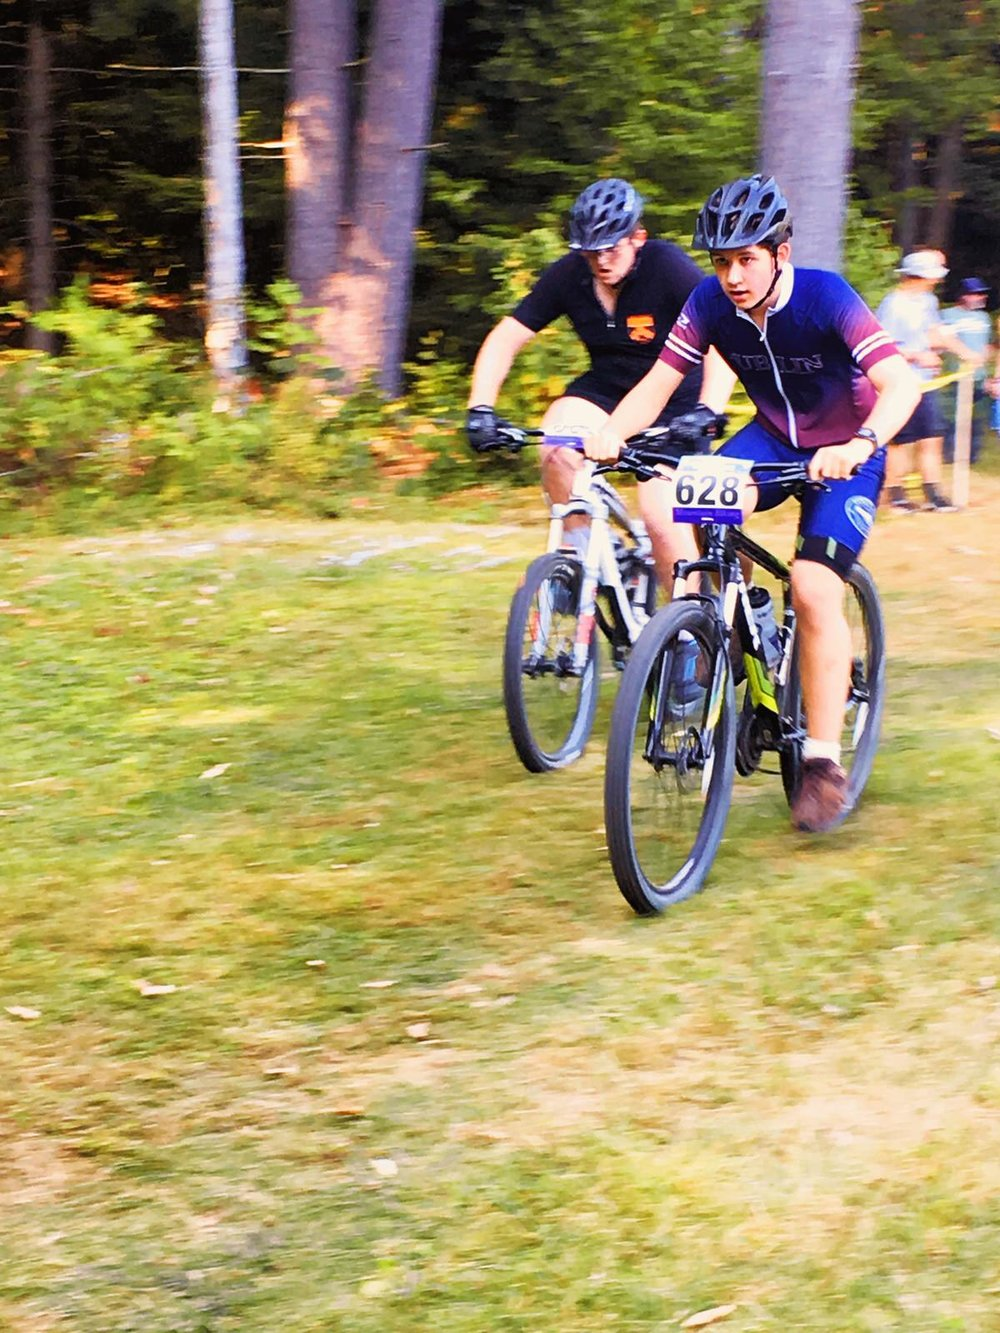 Mountain Biking at Vermont Academy - September 27, 2017  - 7945.JPG